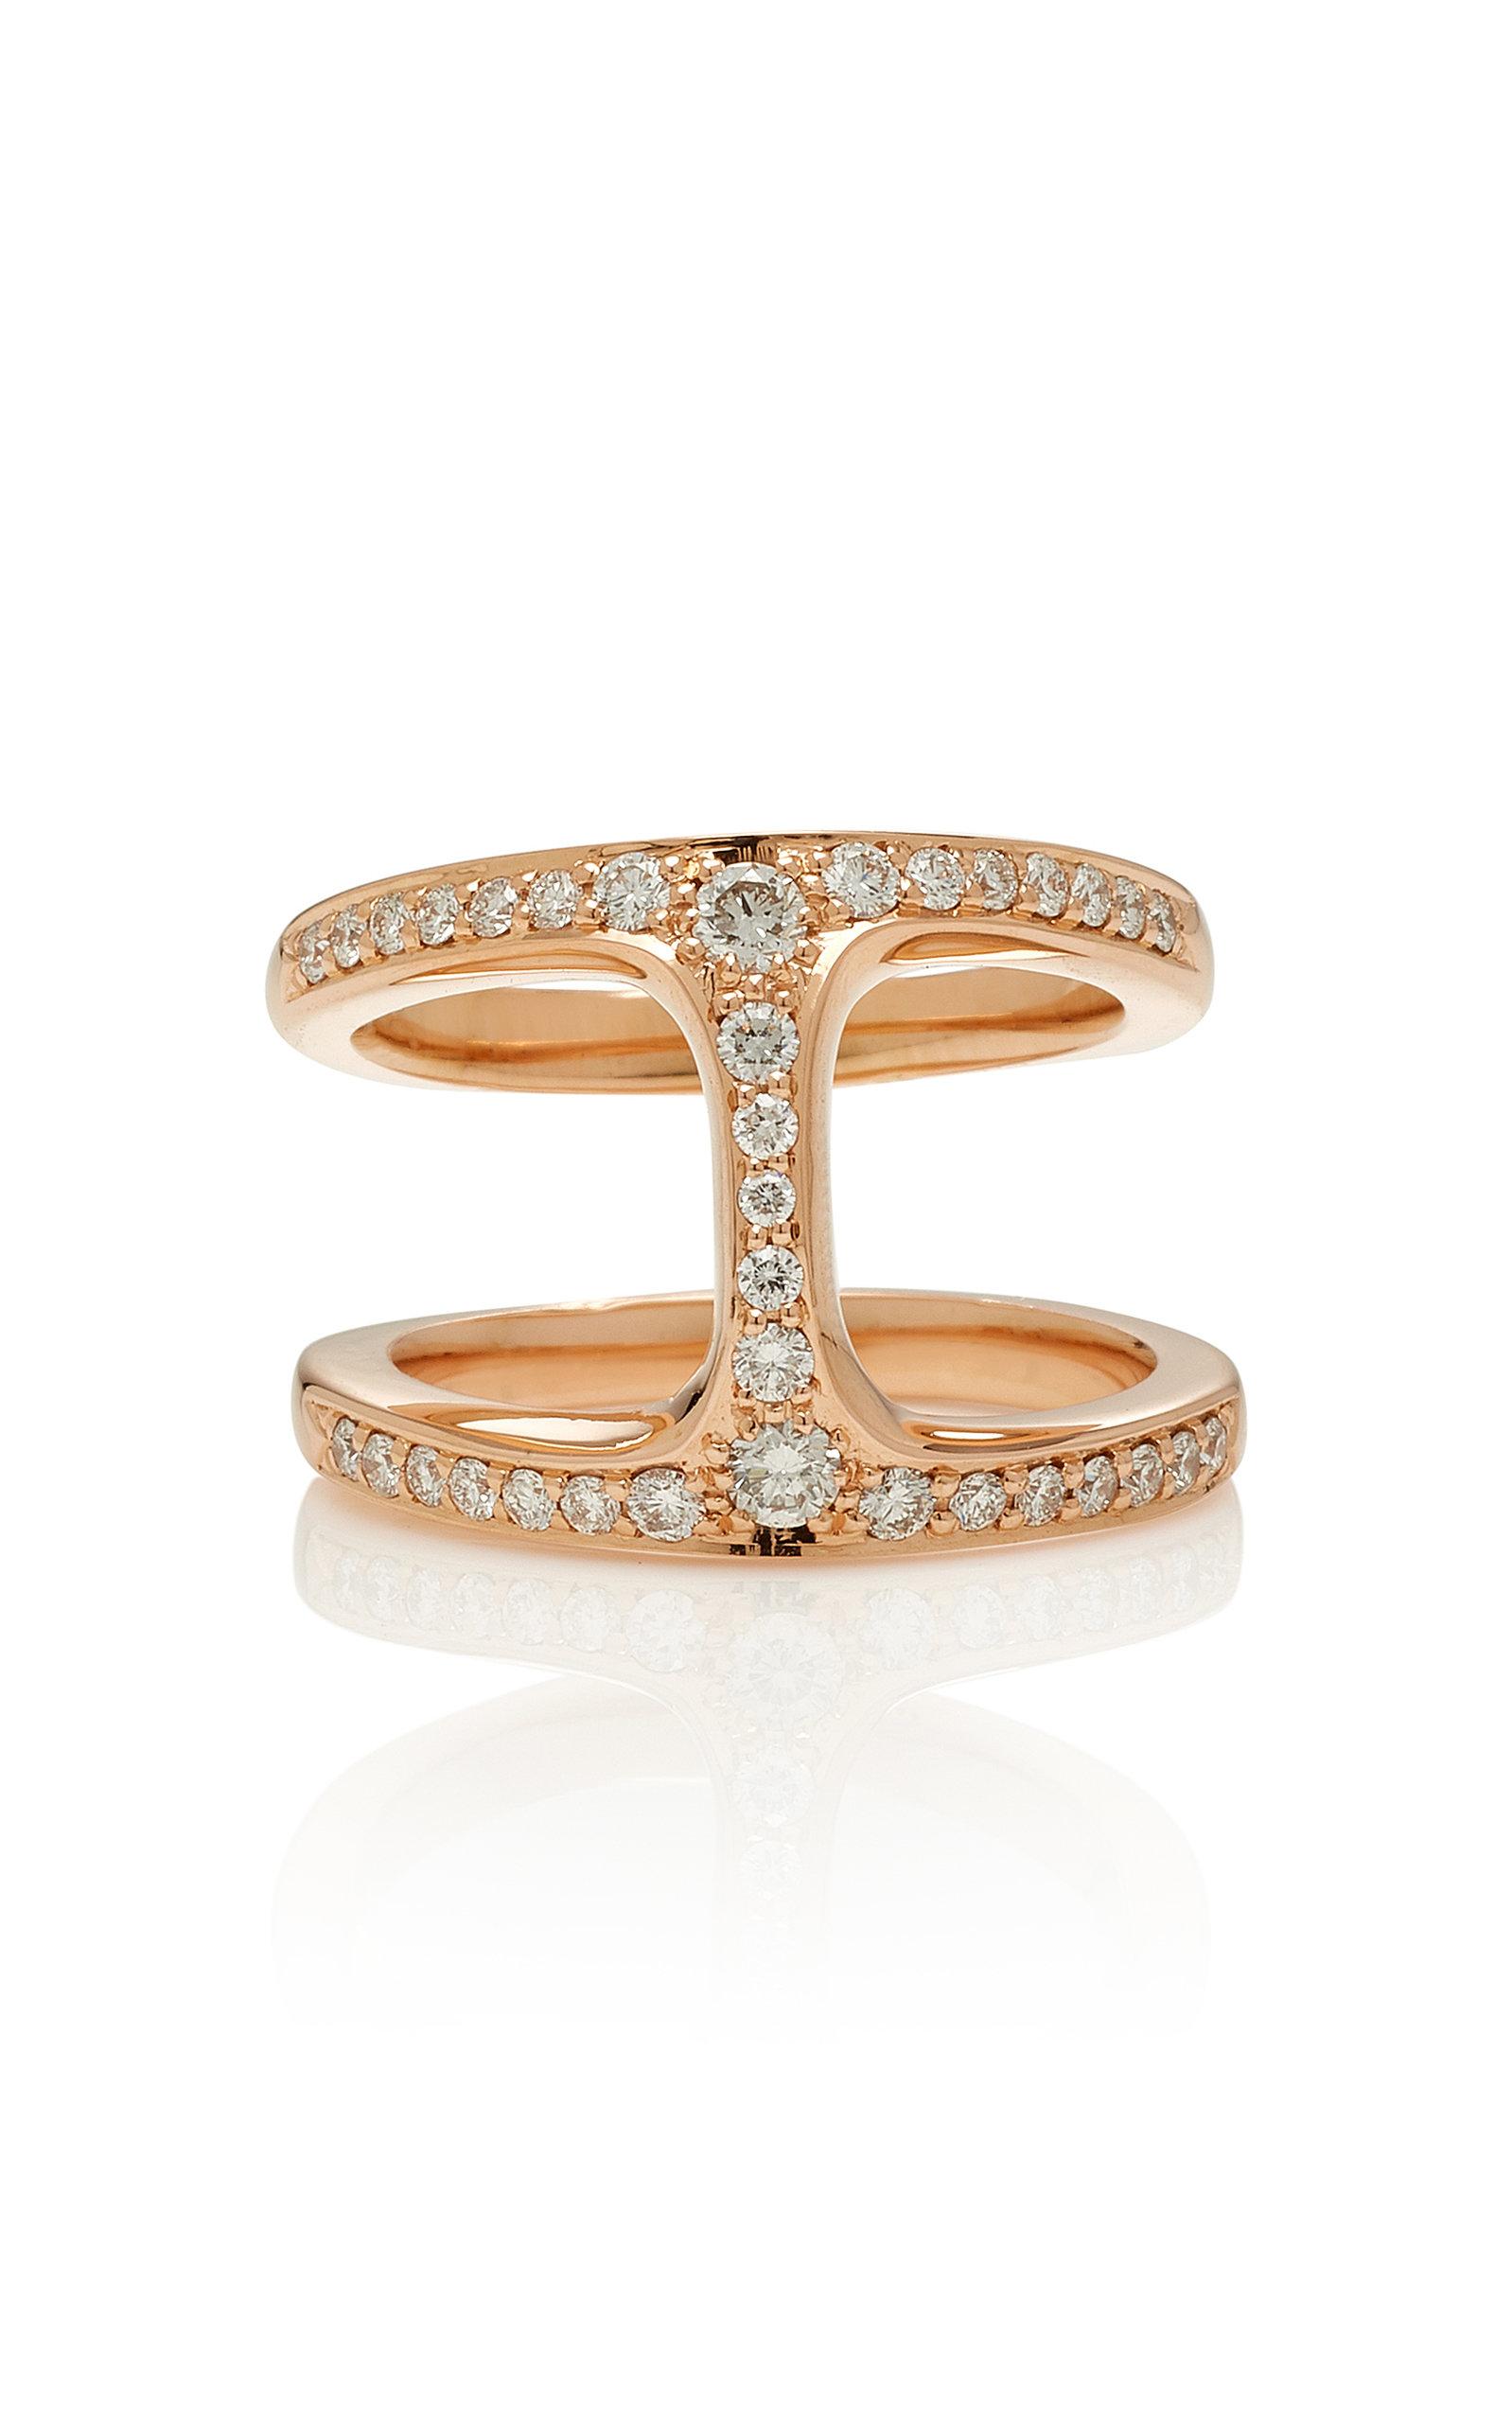 043d0c82 Dame Diamond Phantom Ring by Hoorsenbuhs | Moda Operandi